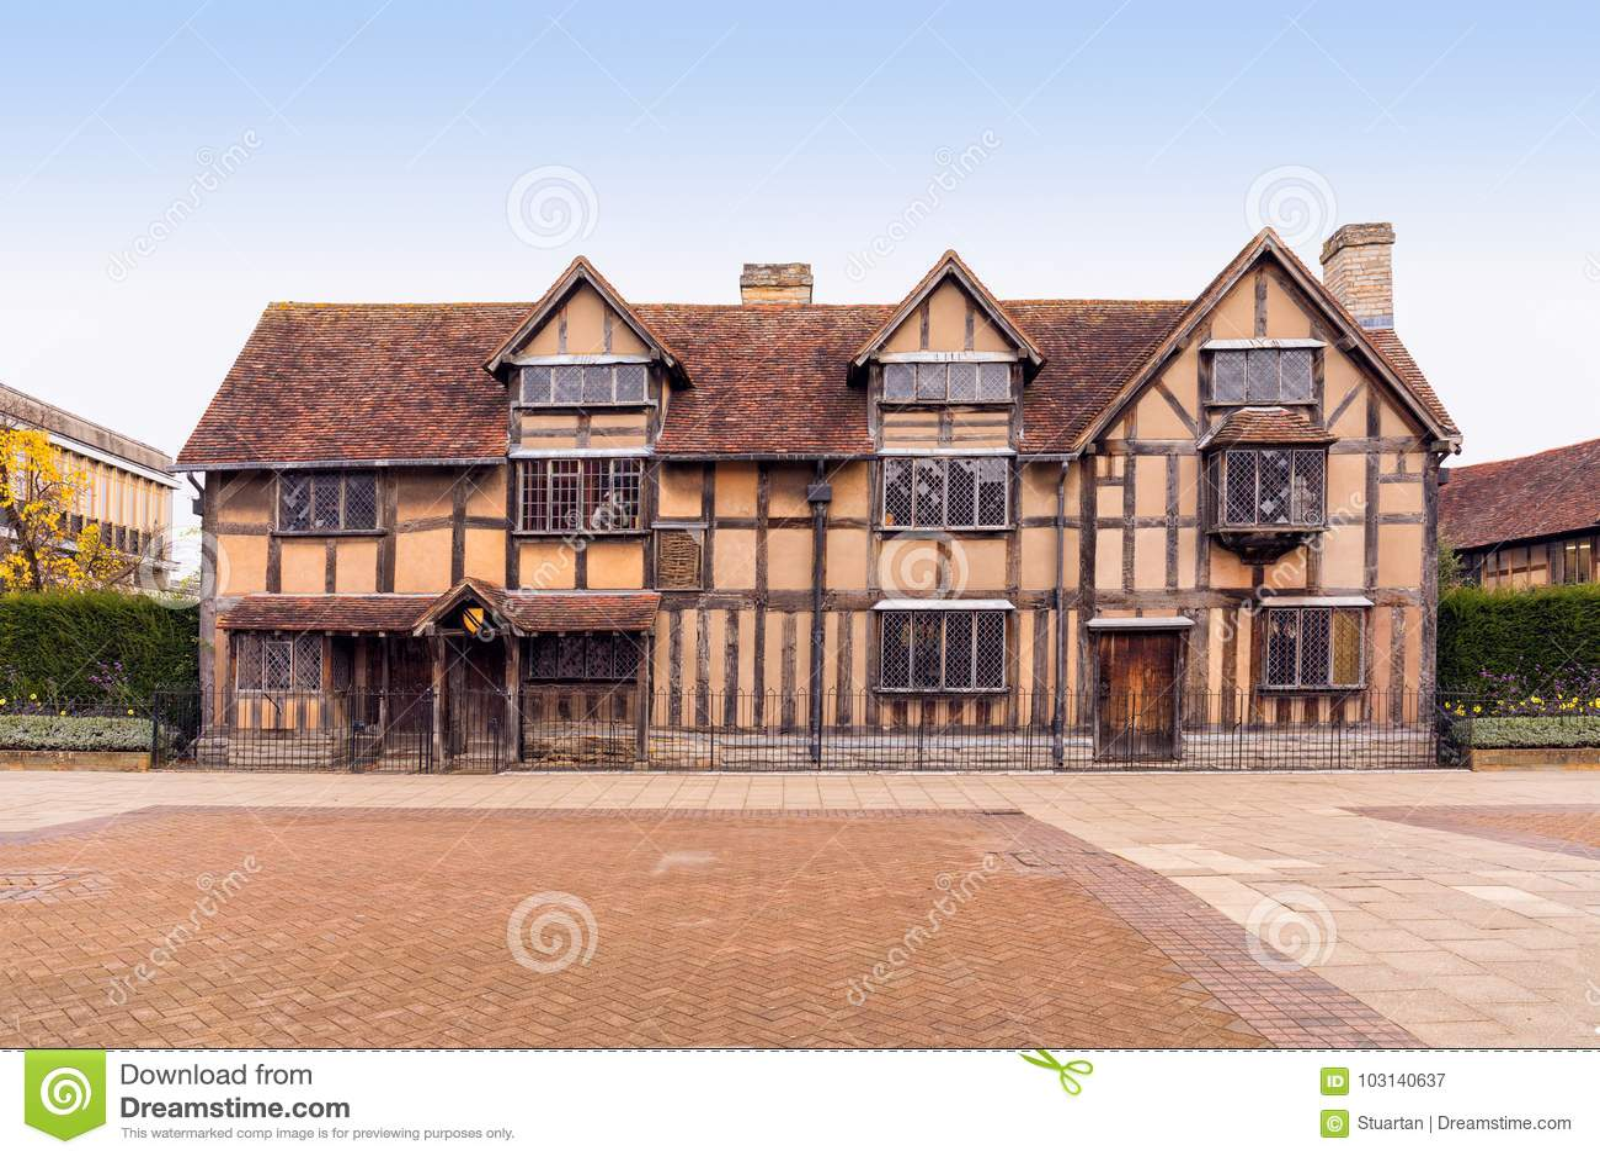 Shakespeares Birthplace Stratford Upon Avon Warwickshire England